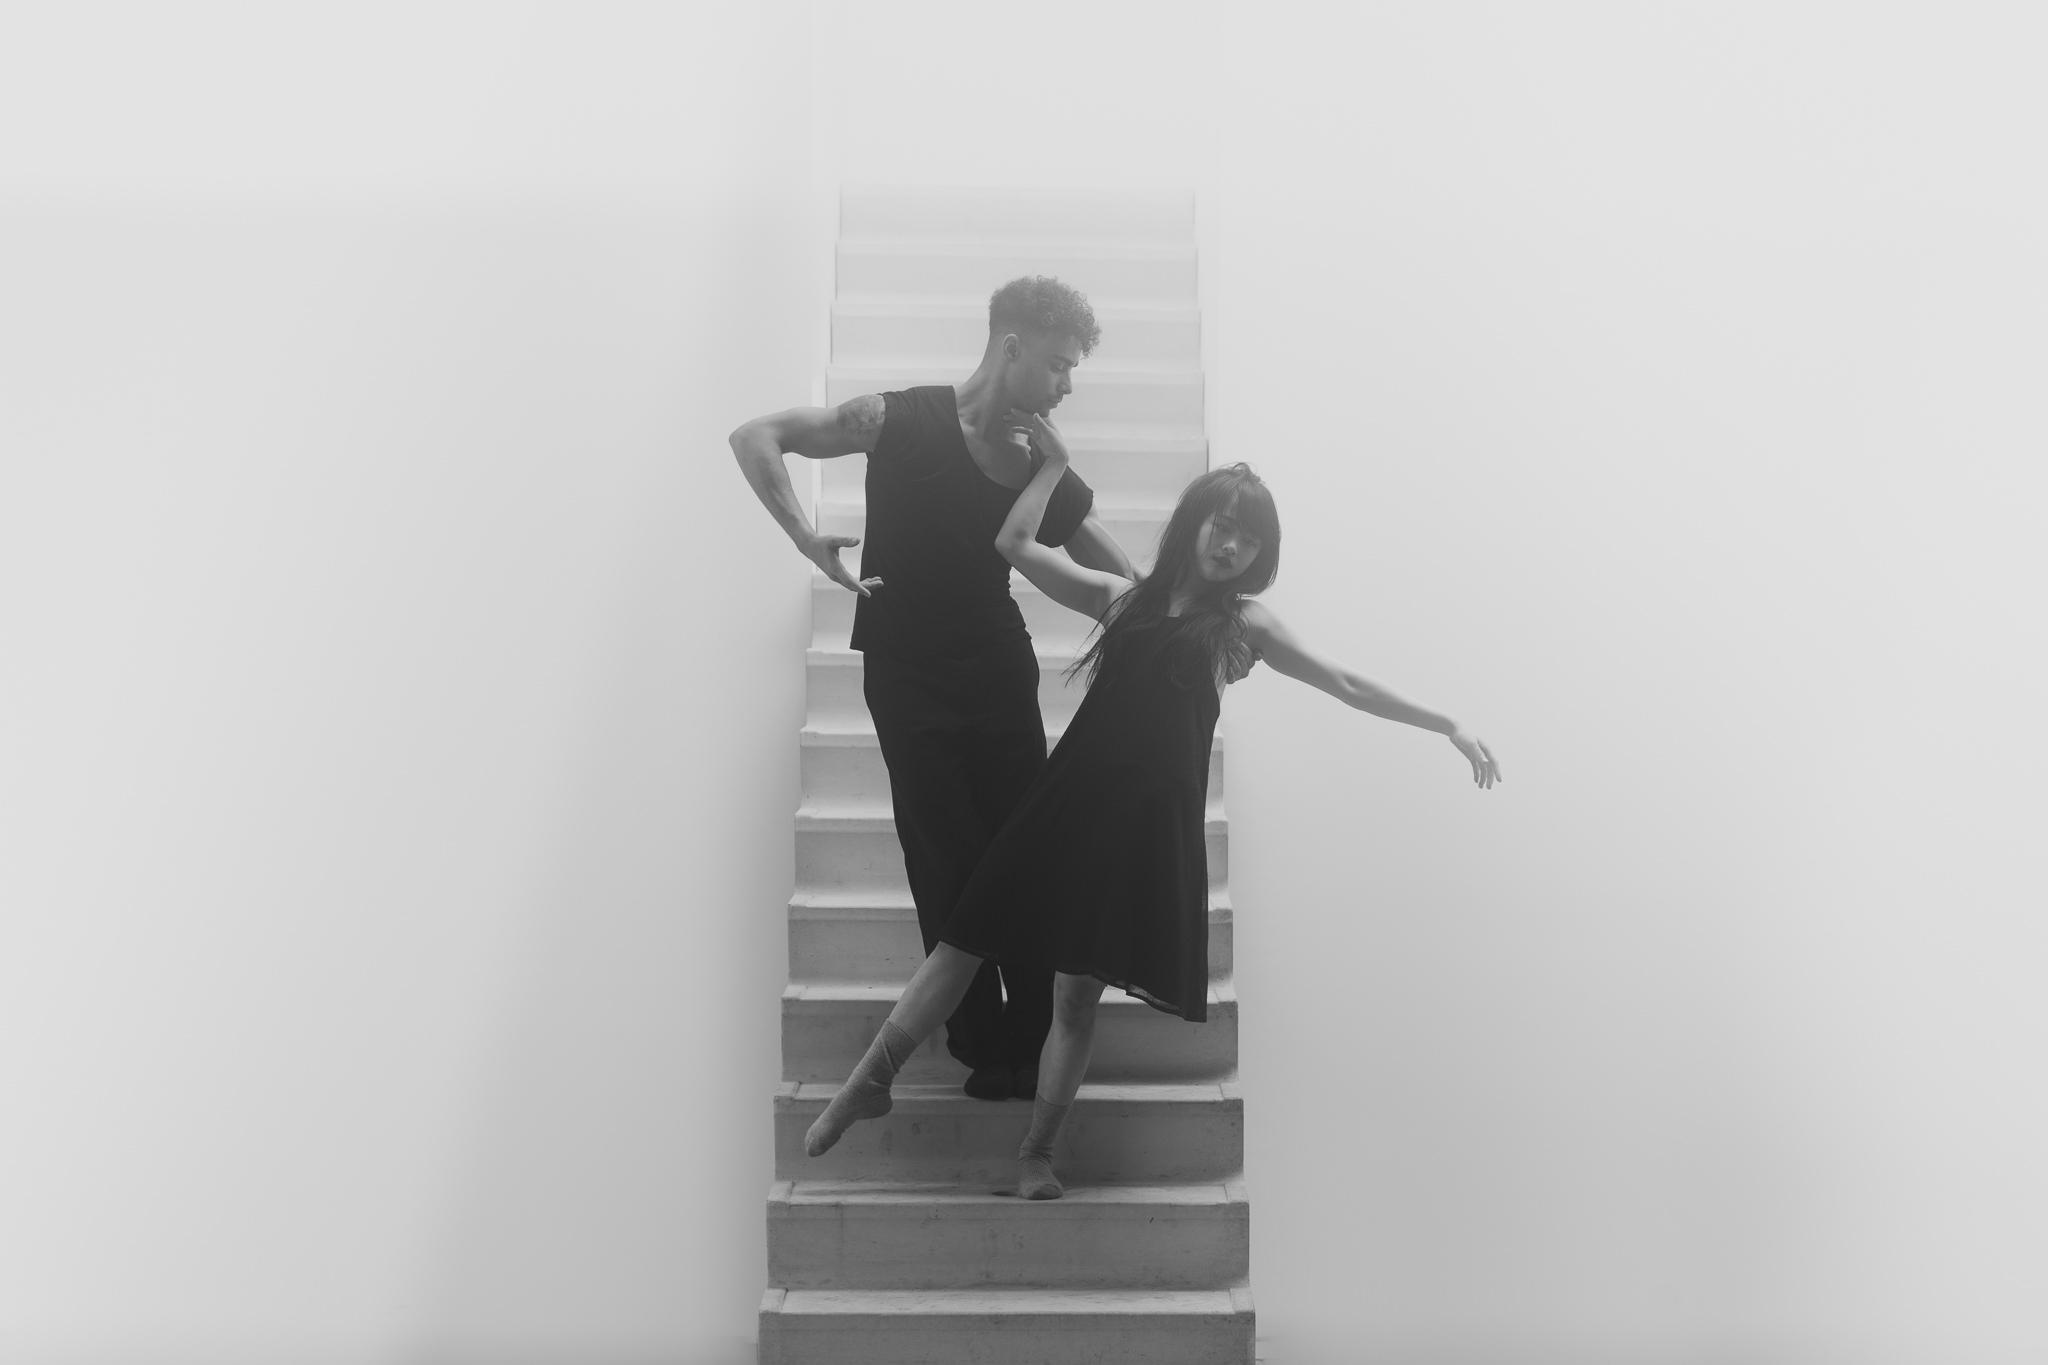 Naomi van der Kraan - Modern dance - artistic photography 33.jpg